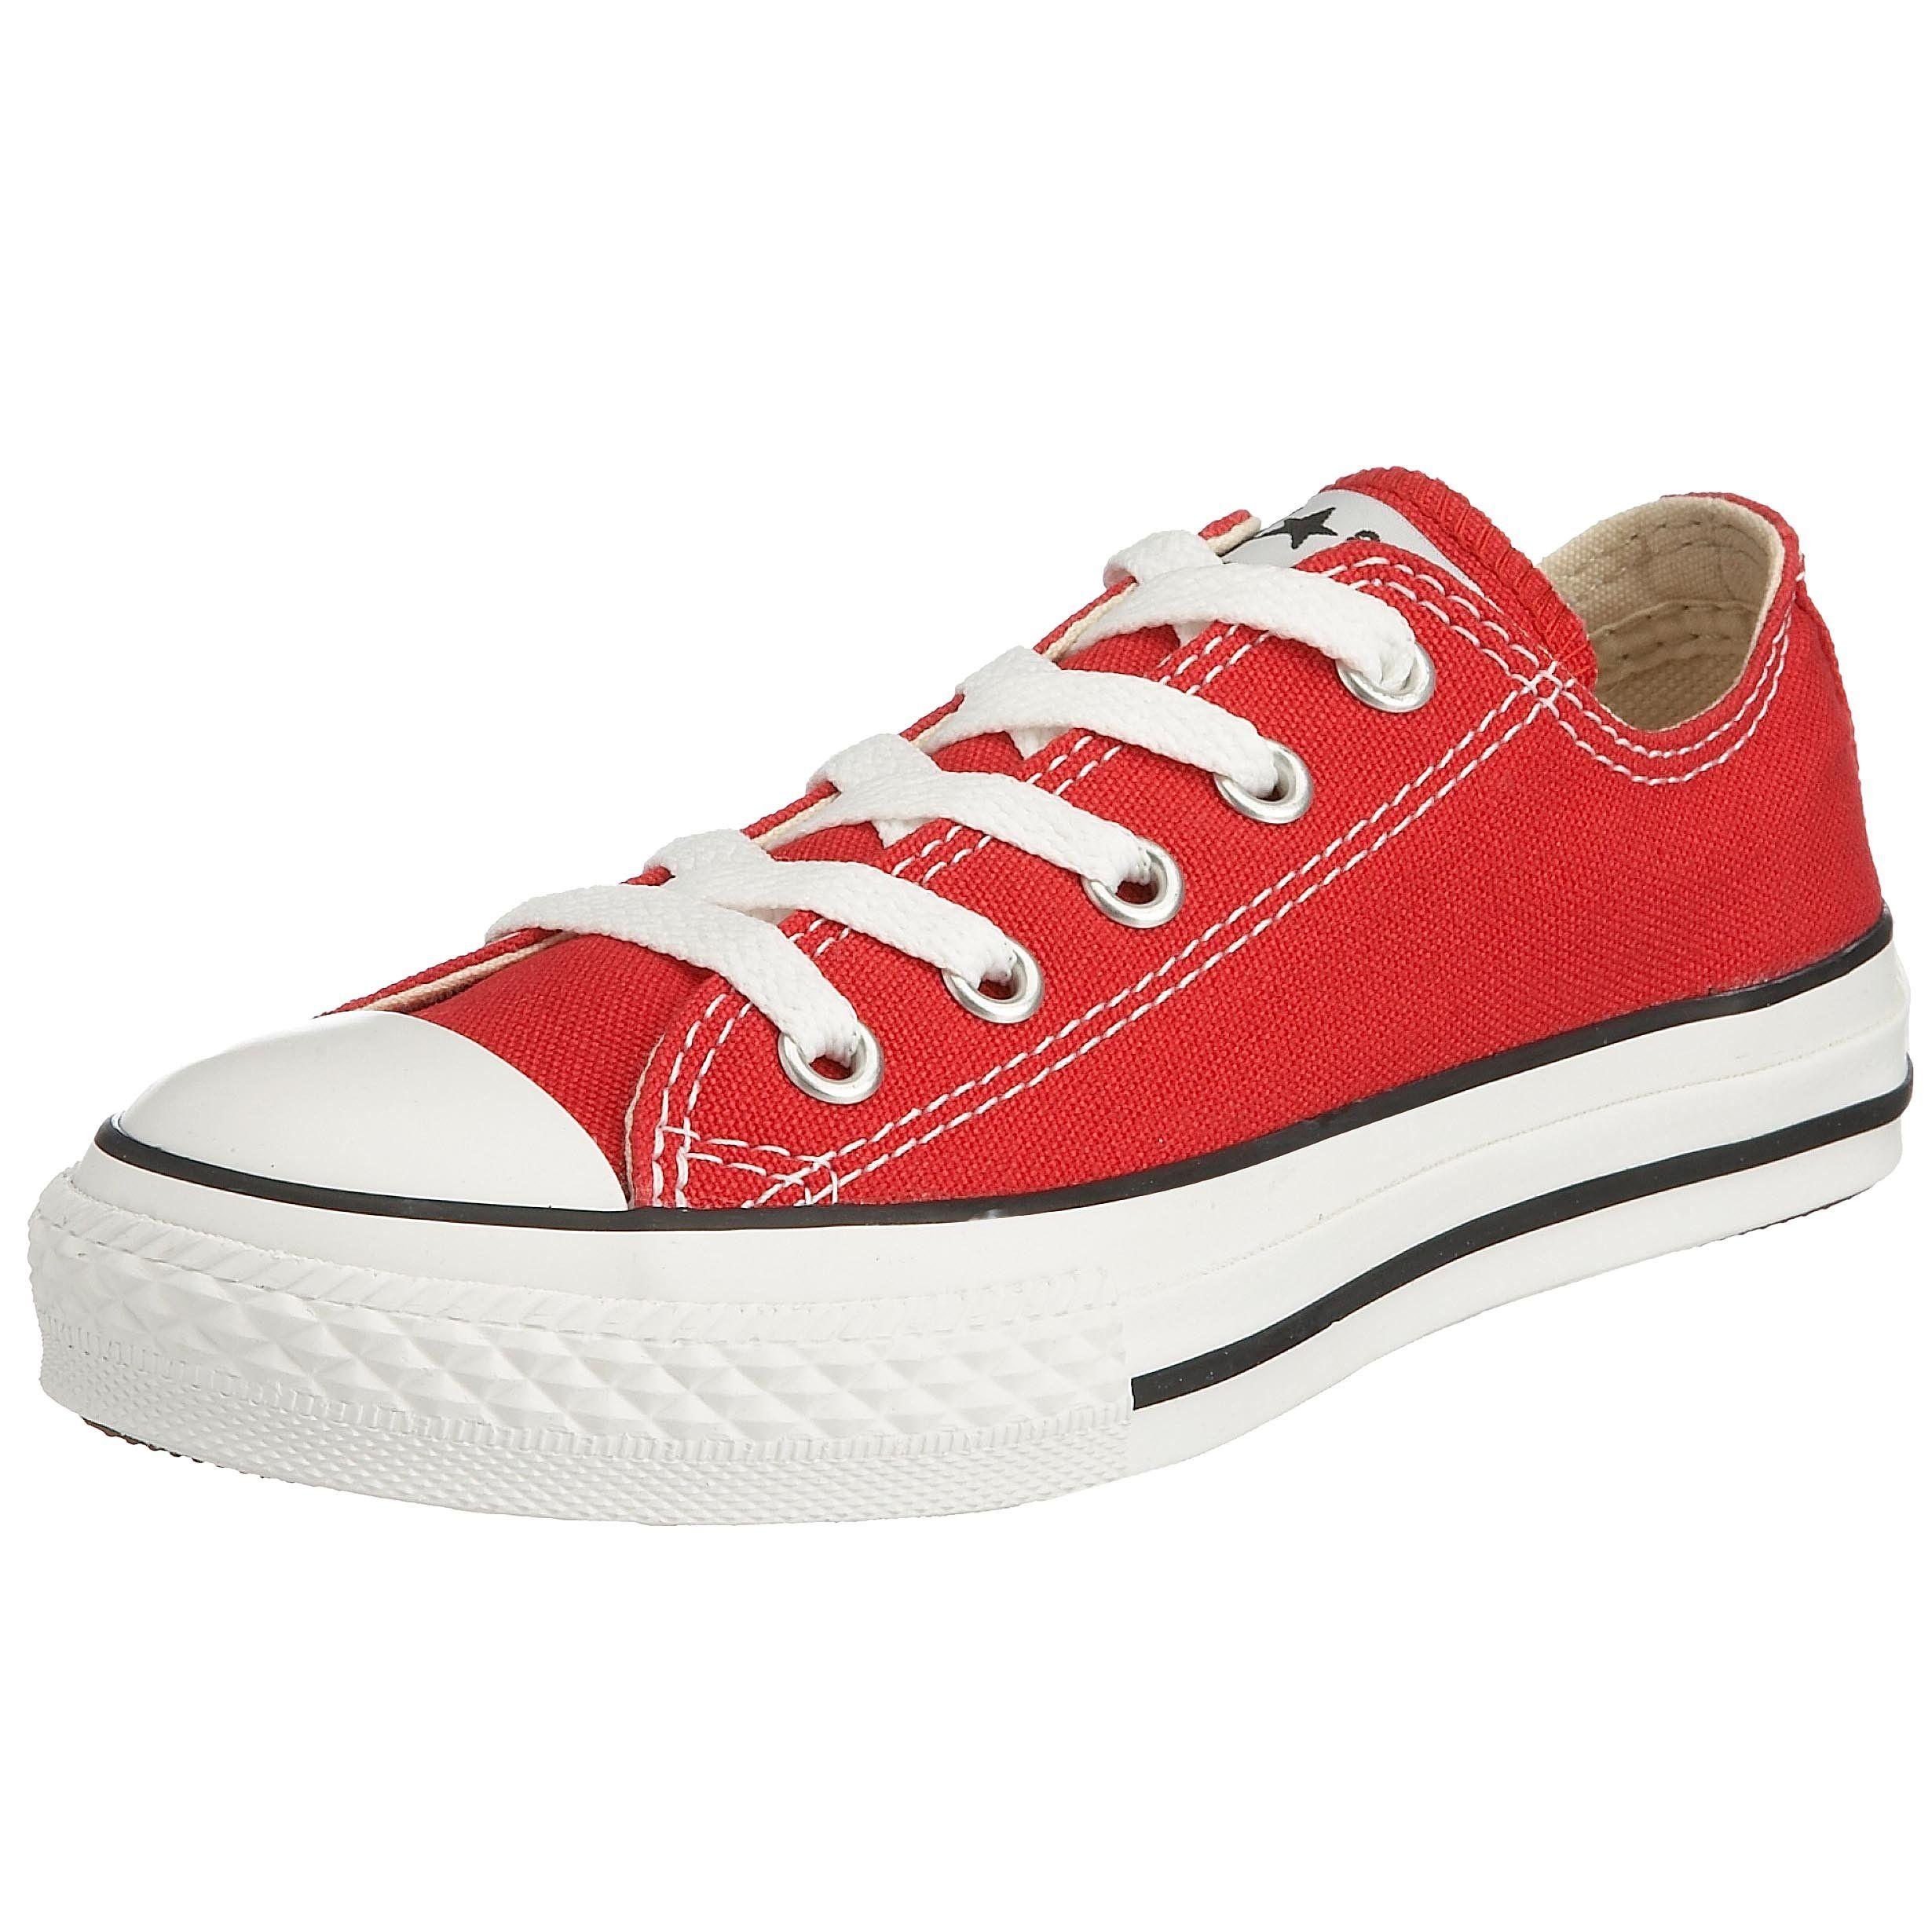 41d57cf9a3ea1 Amazon.com: Converse Chuck Taylor All Star Lo Canvas Sneaker ...